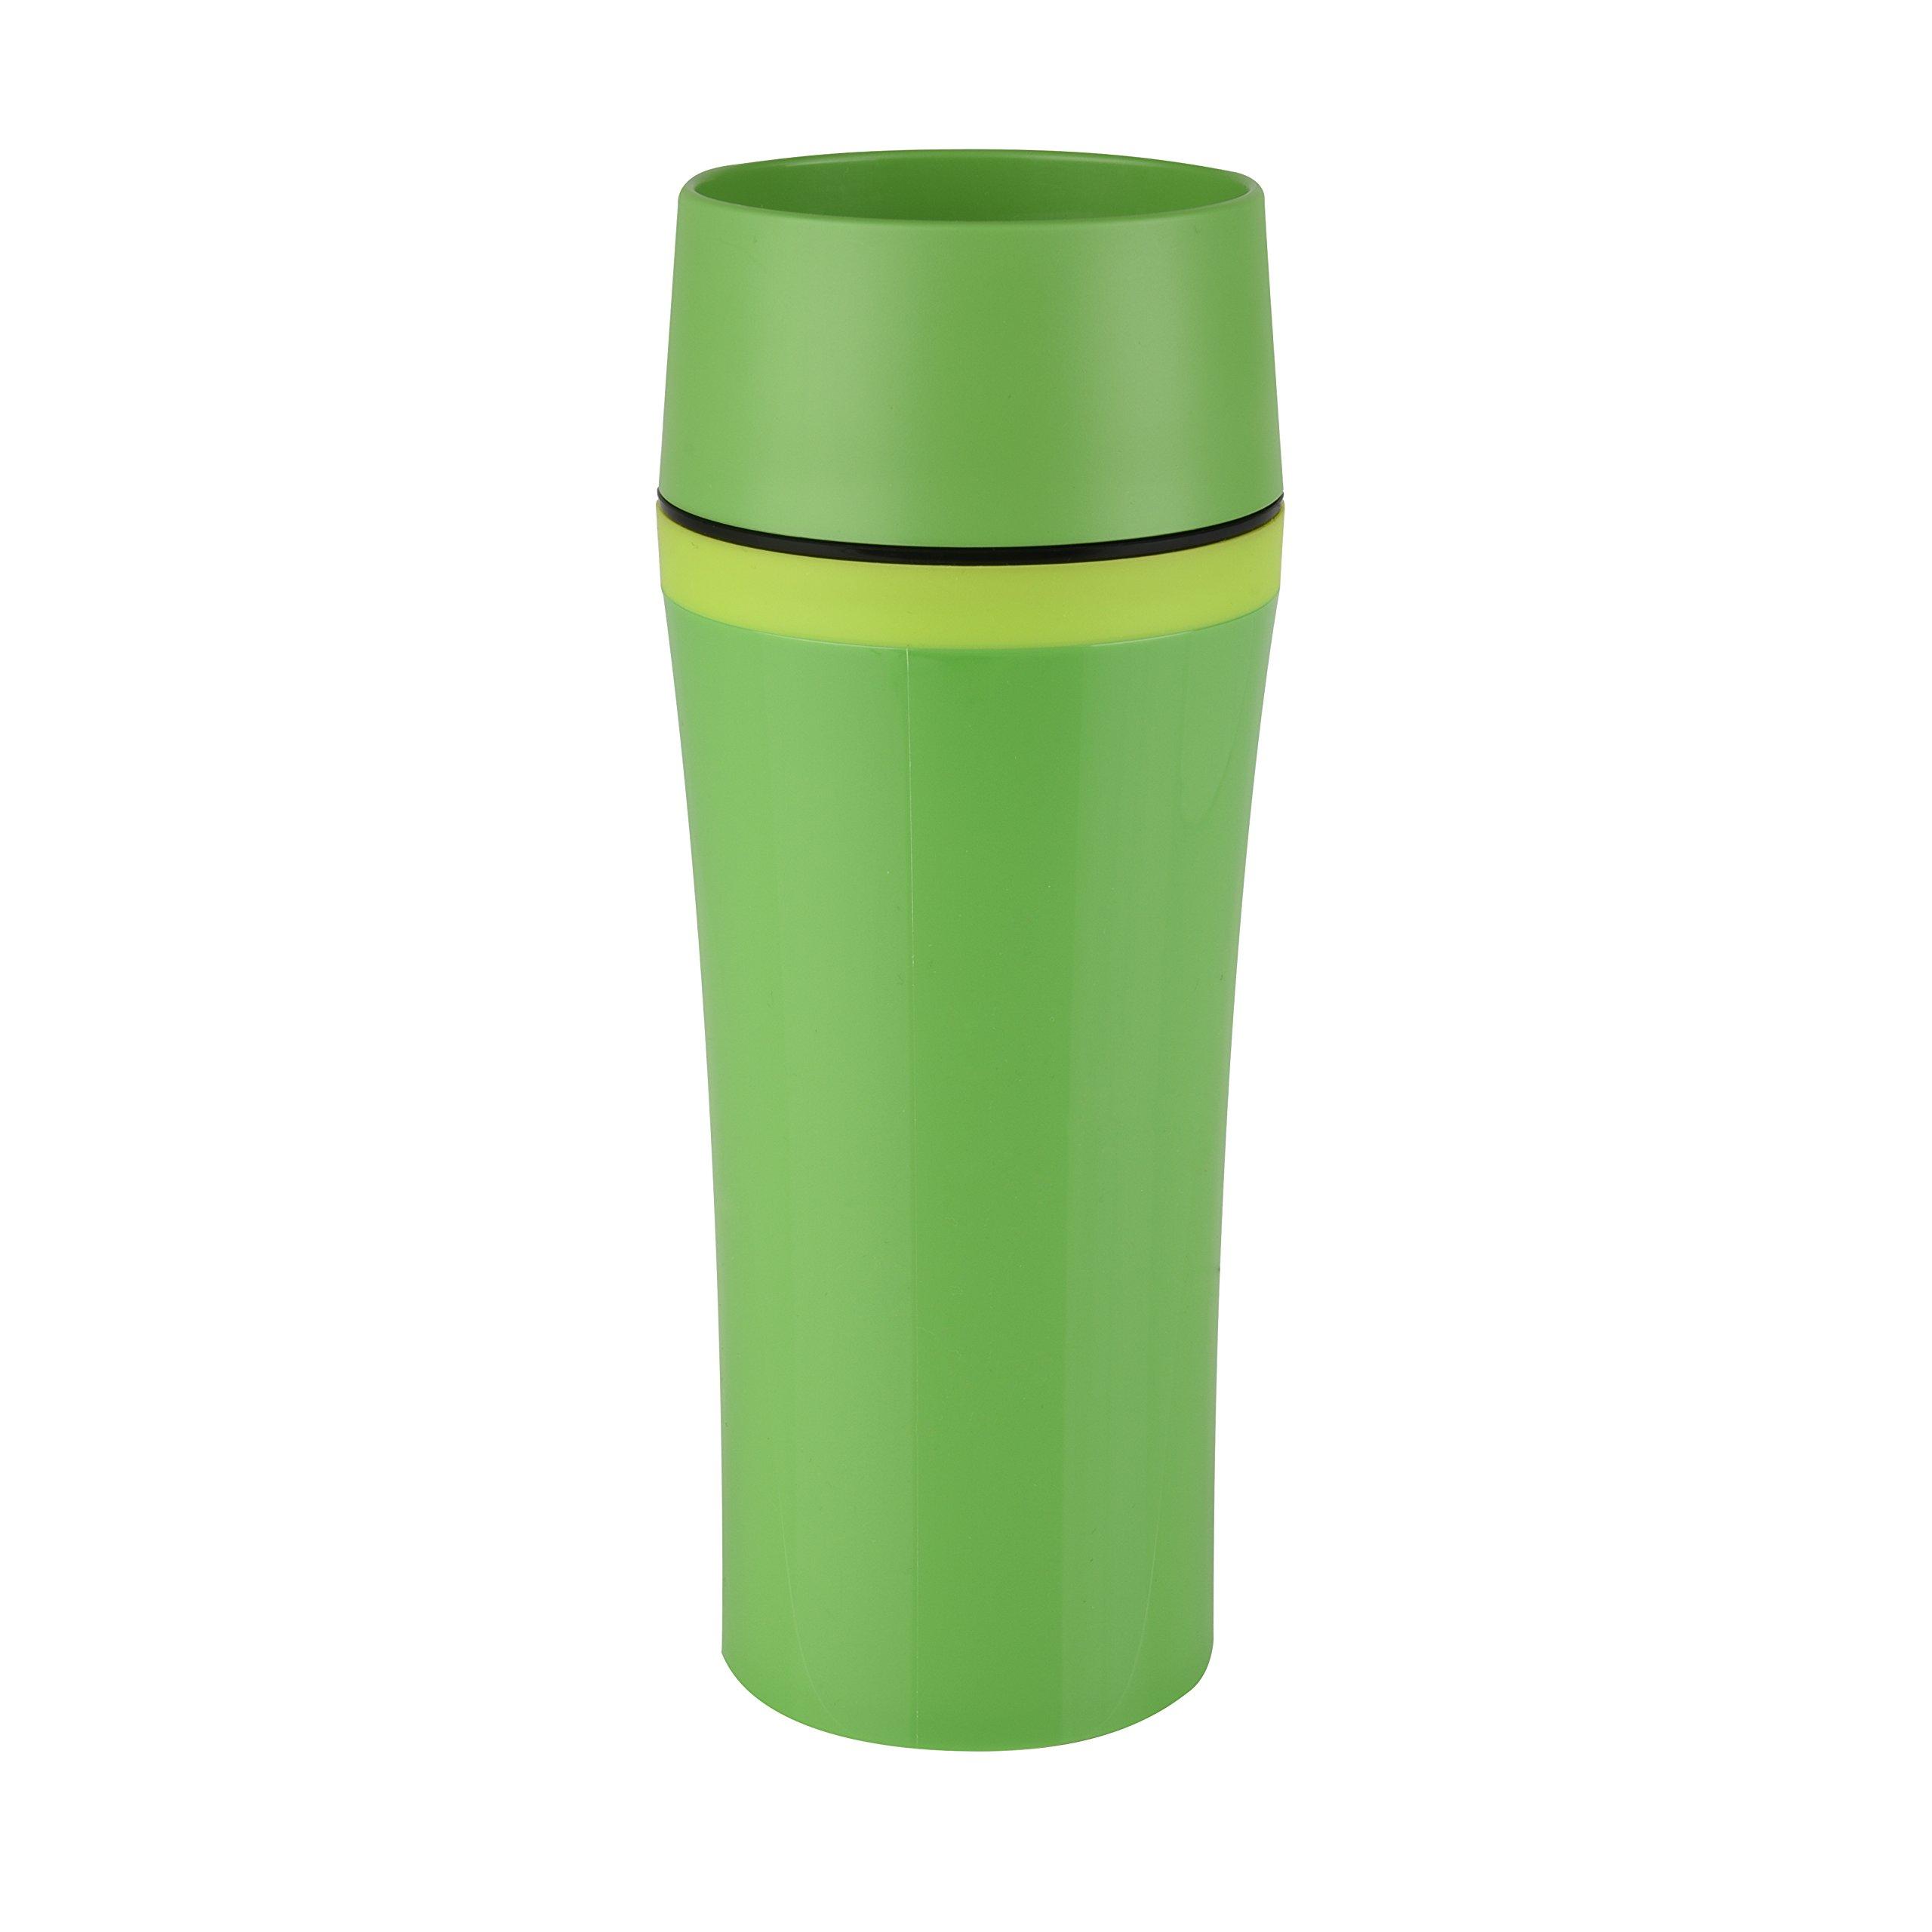 Emsa 514177 Travel Mug Fun Bicchiere Termico, Chiusura Quick Press, 0.36 Litri, Verde Scuro/Verde C